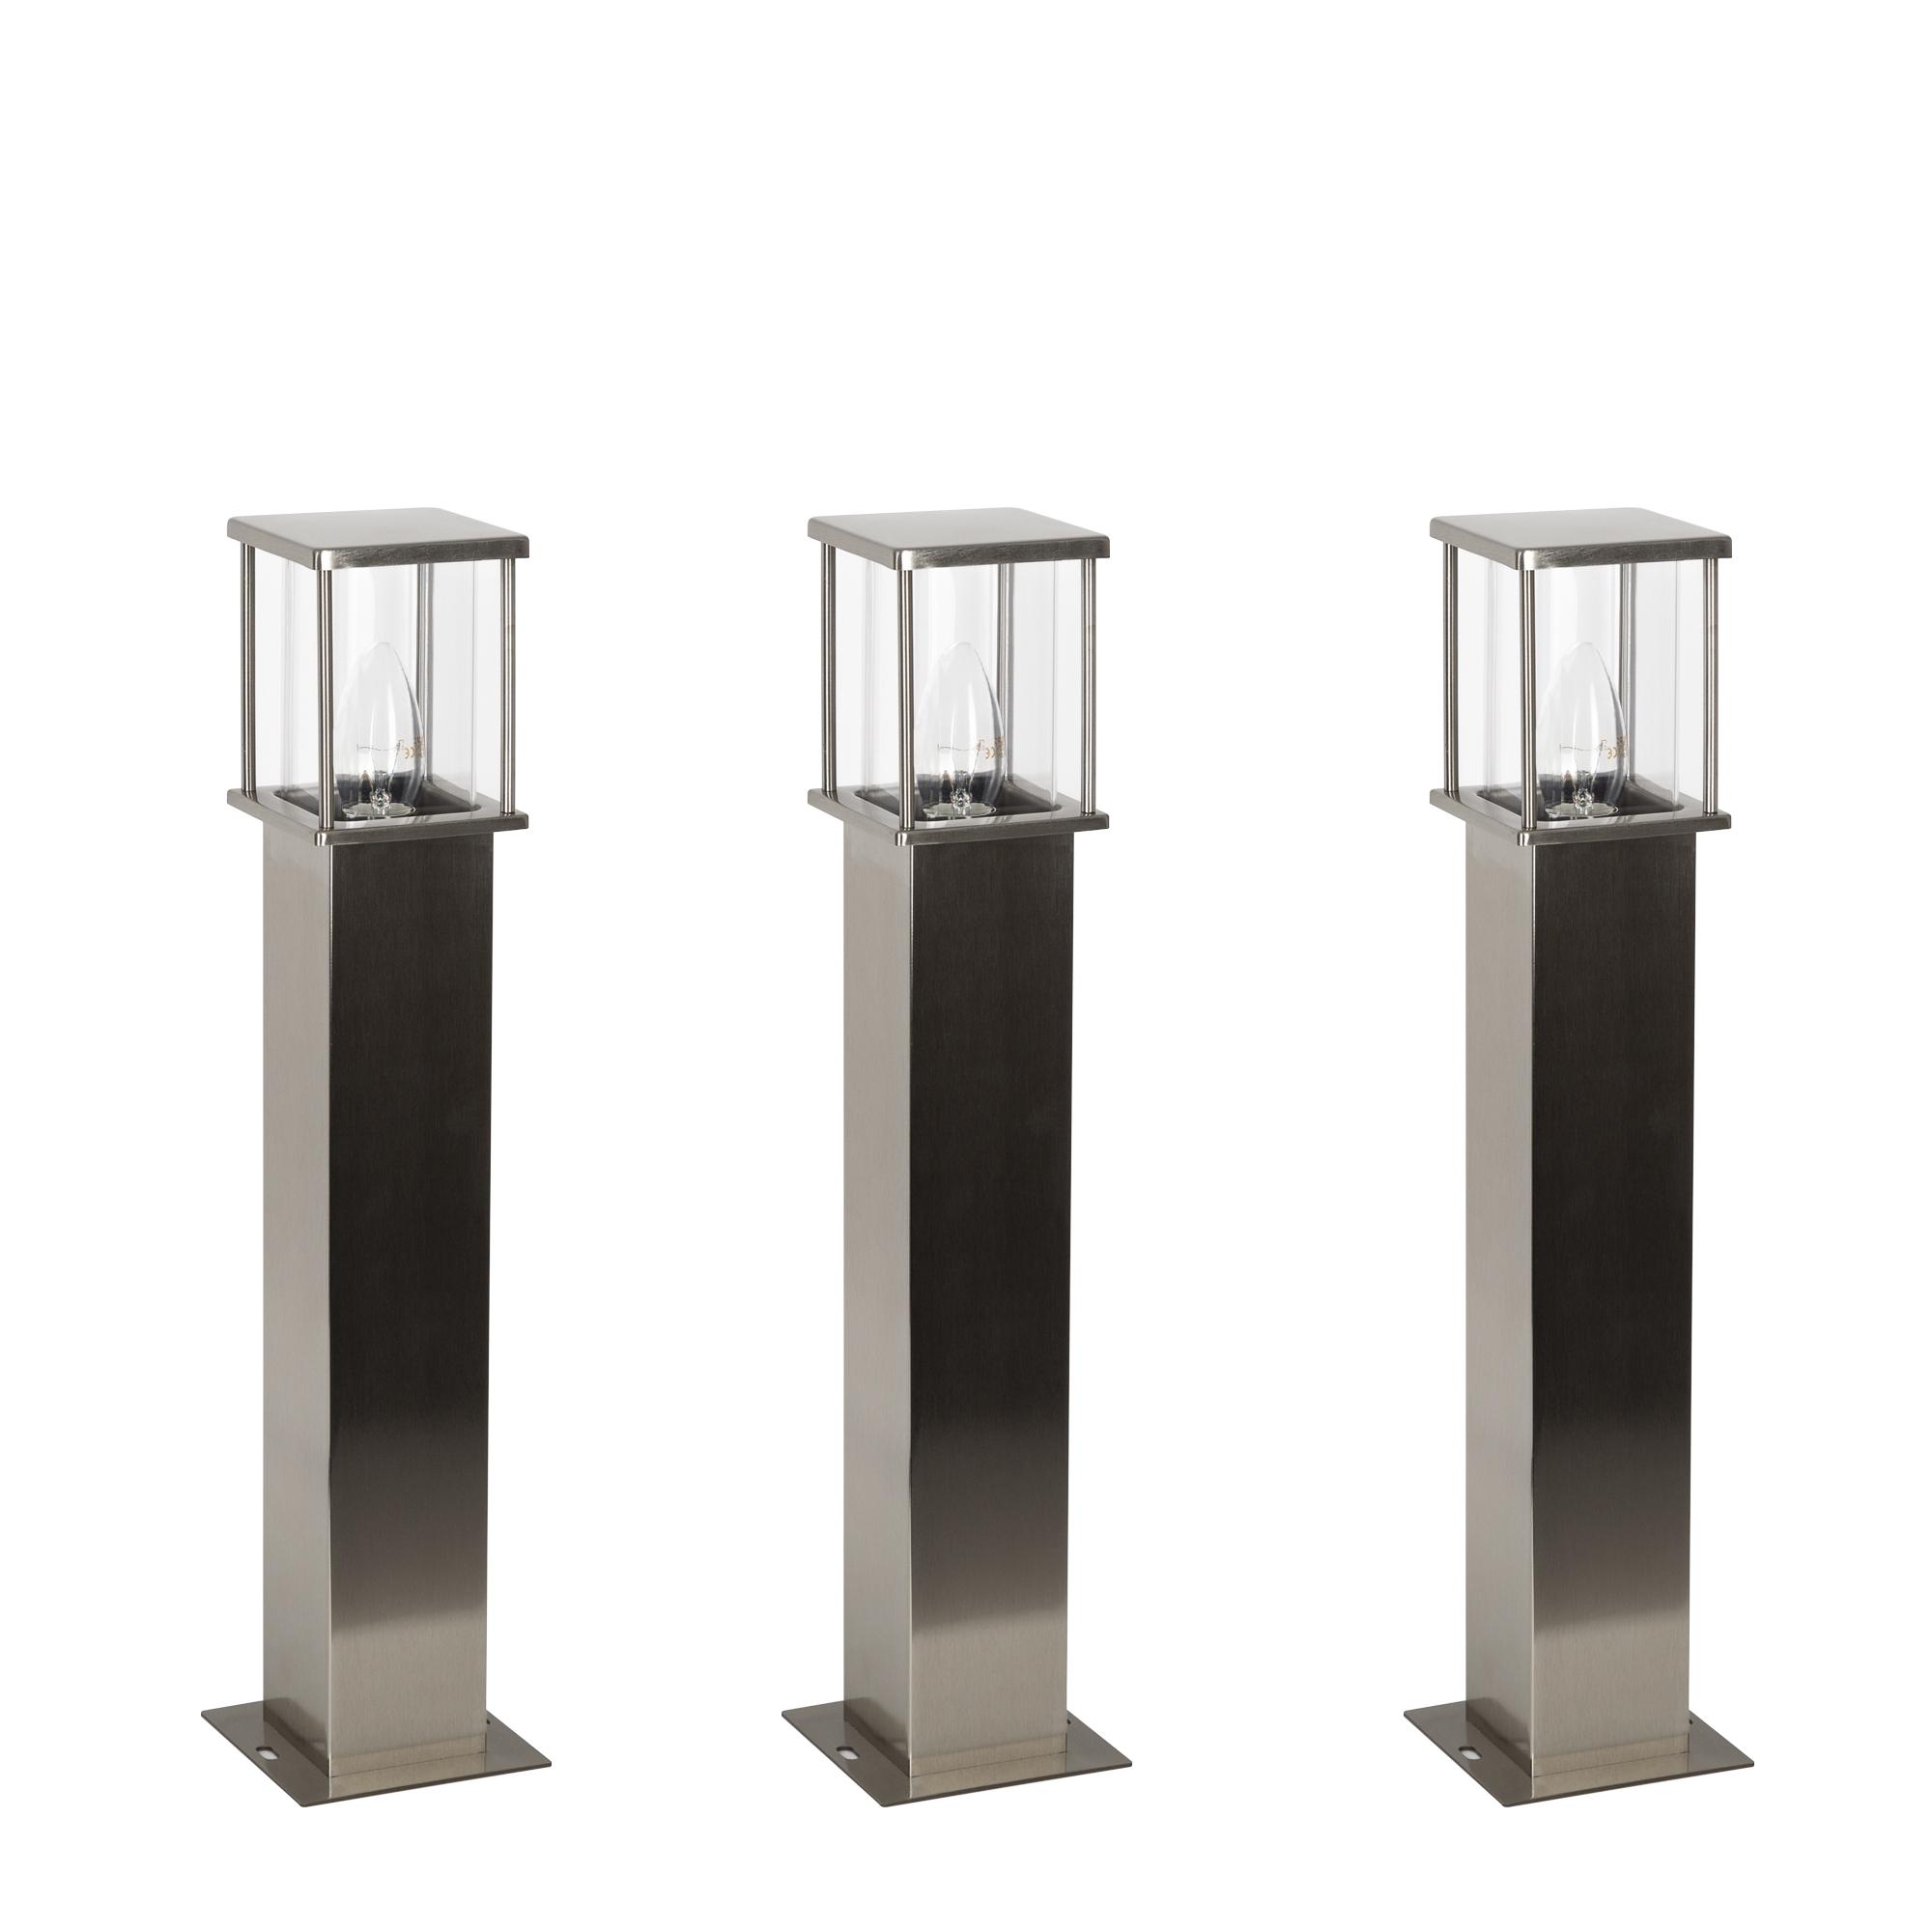 Astro 2 set 3 stuks tuinlamp